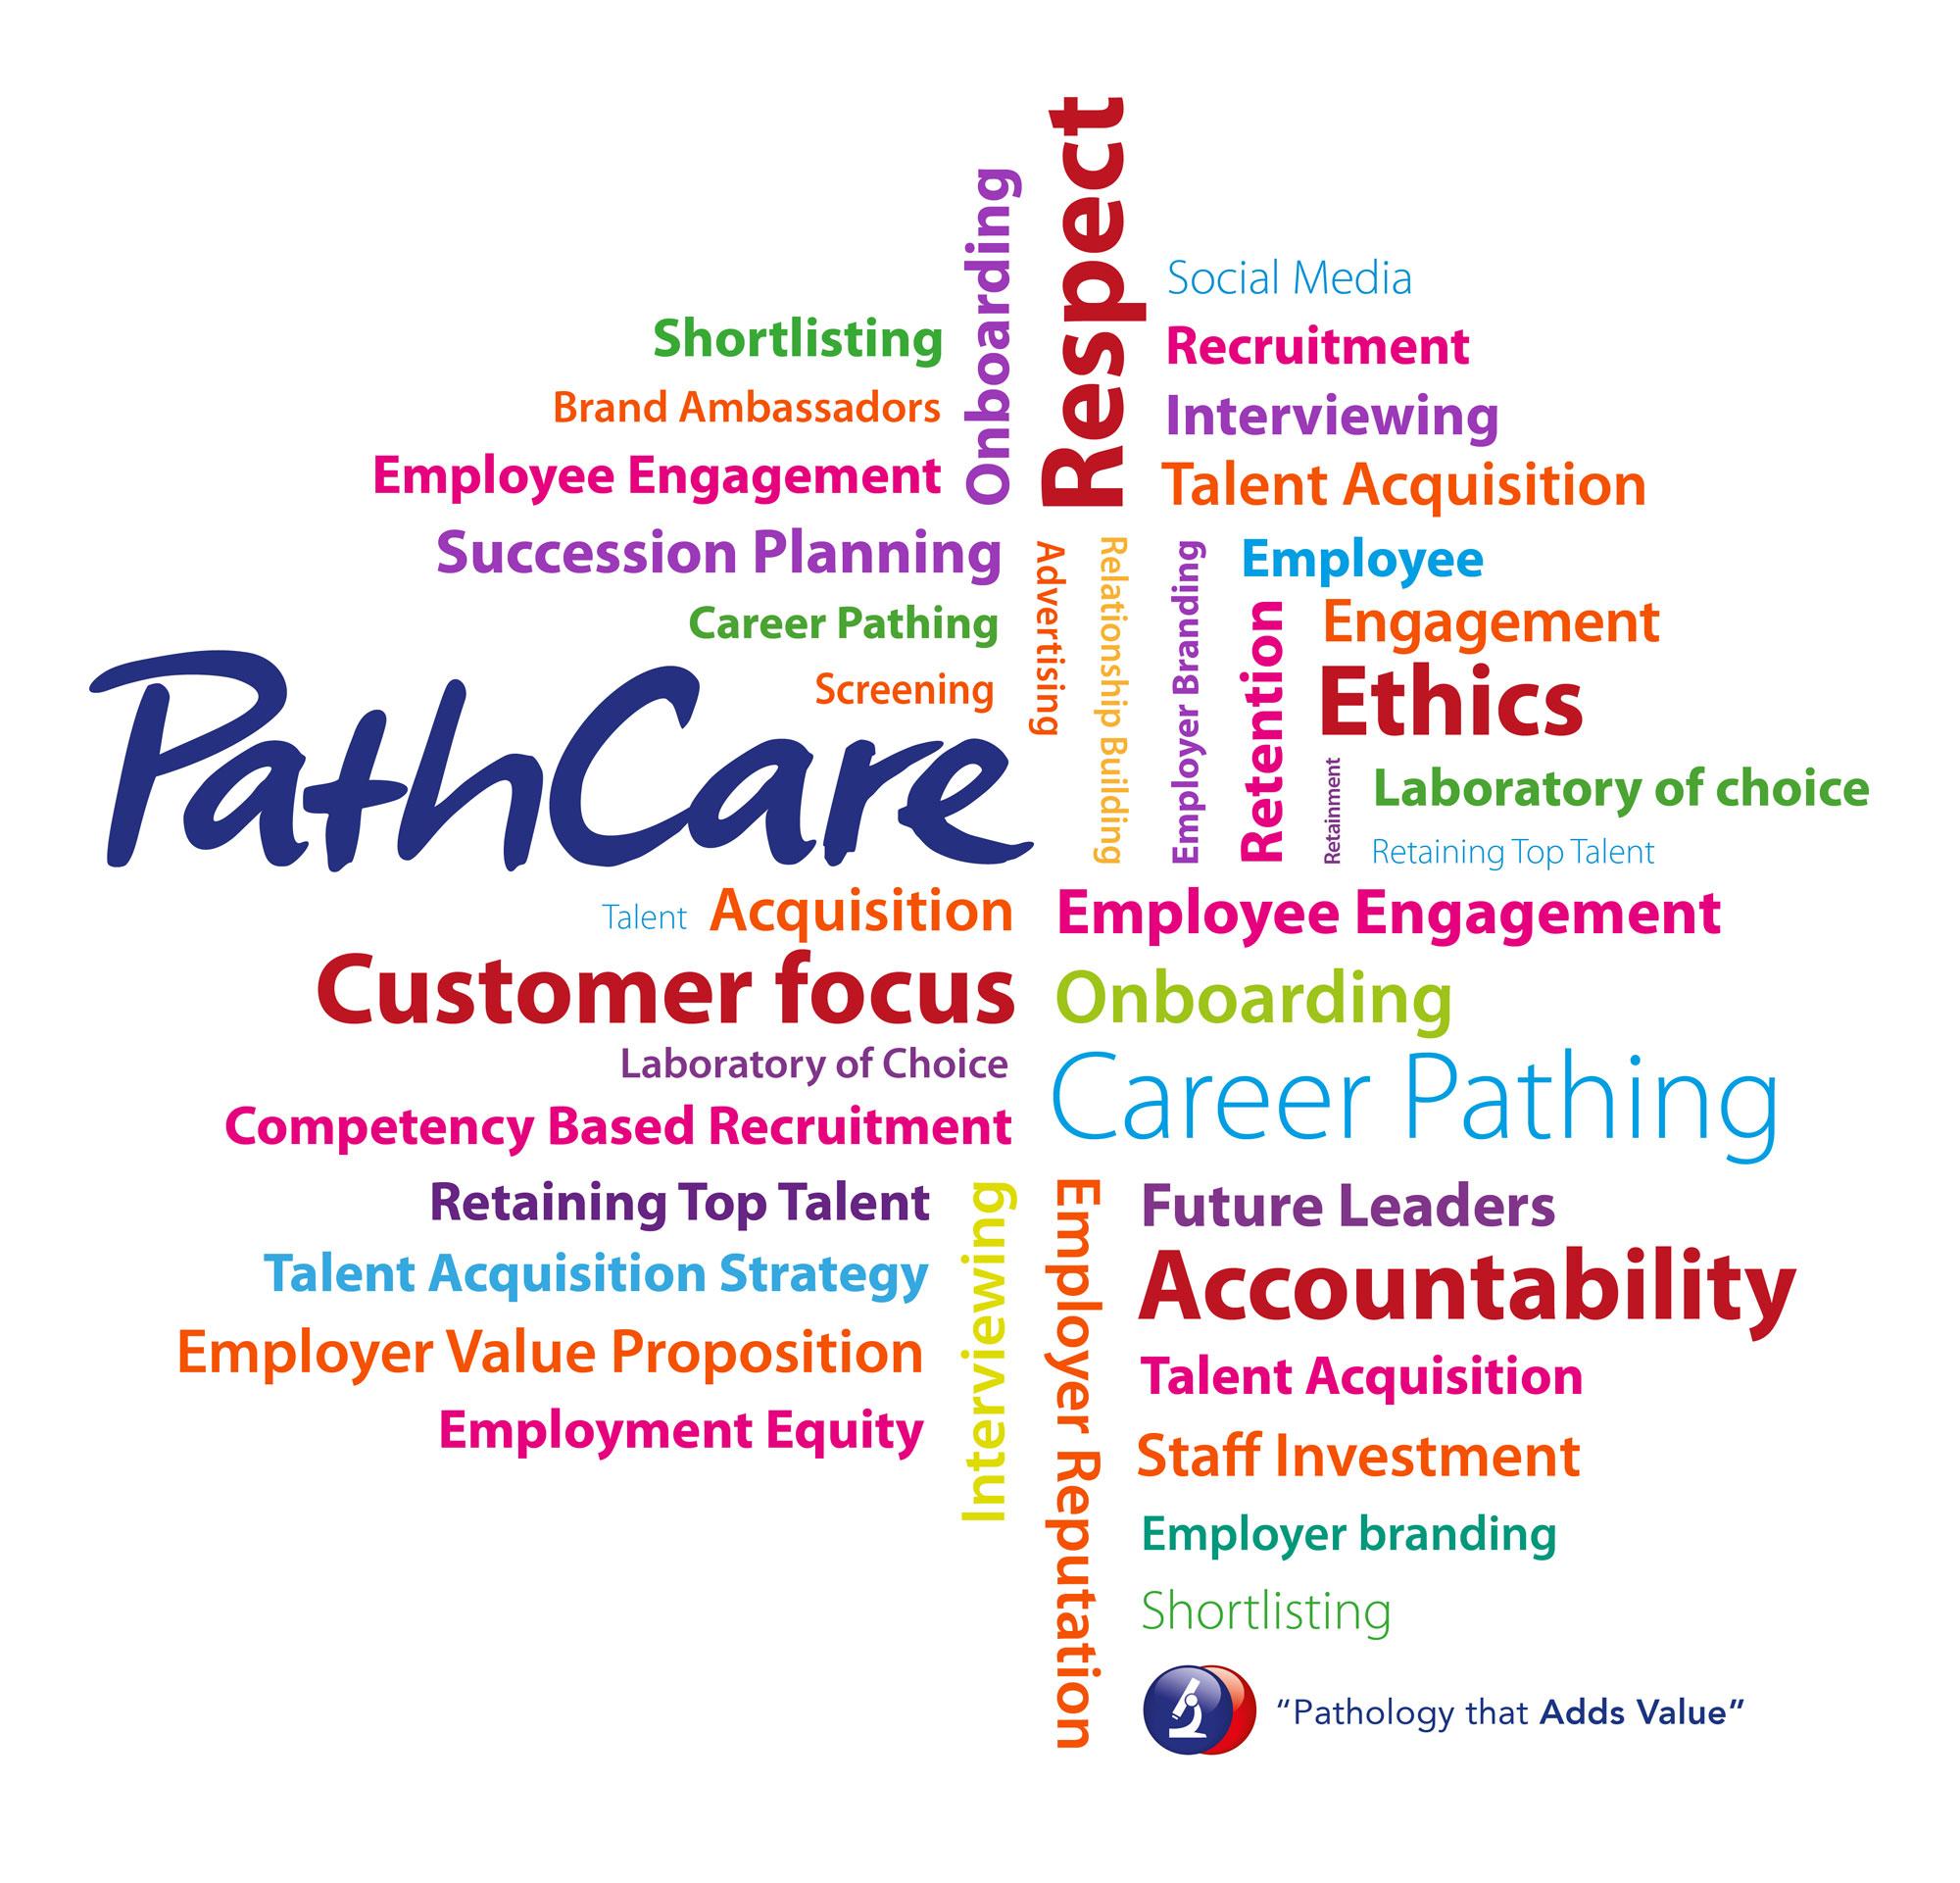 Pathcare Career Roadmap